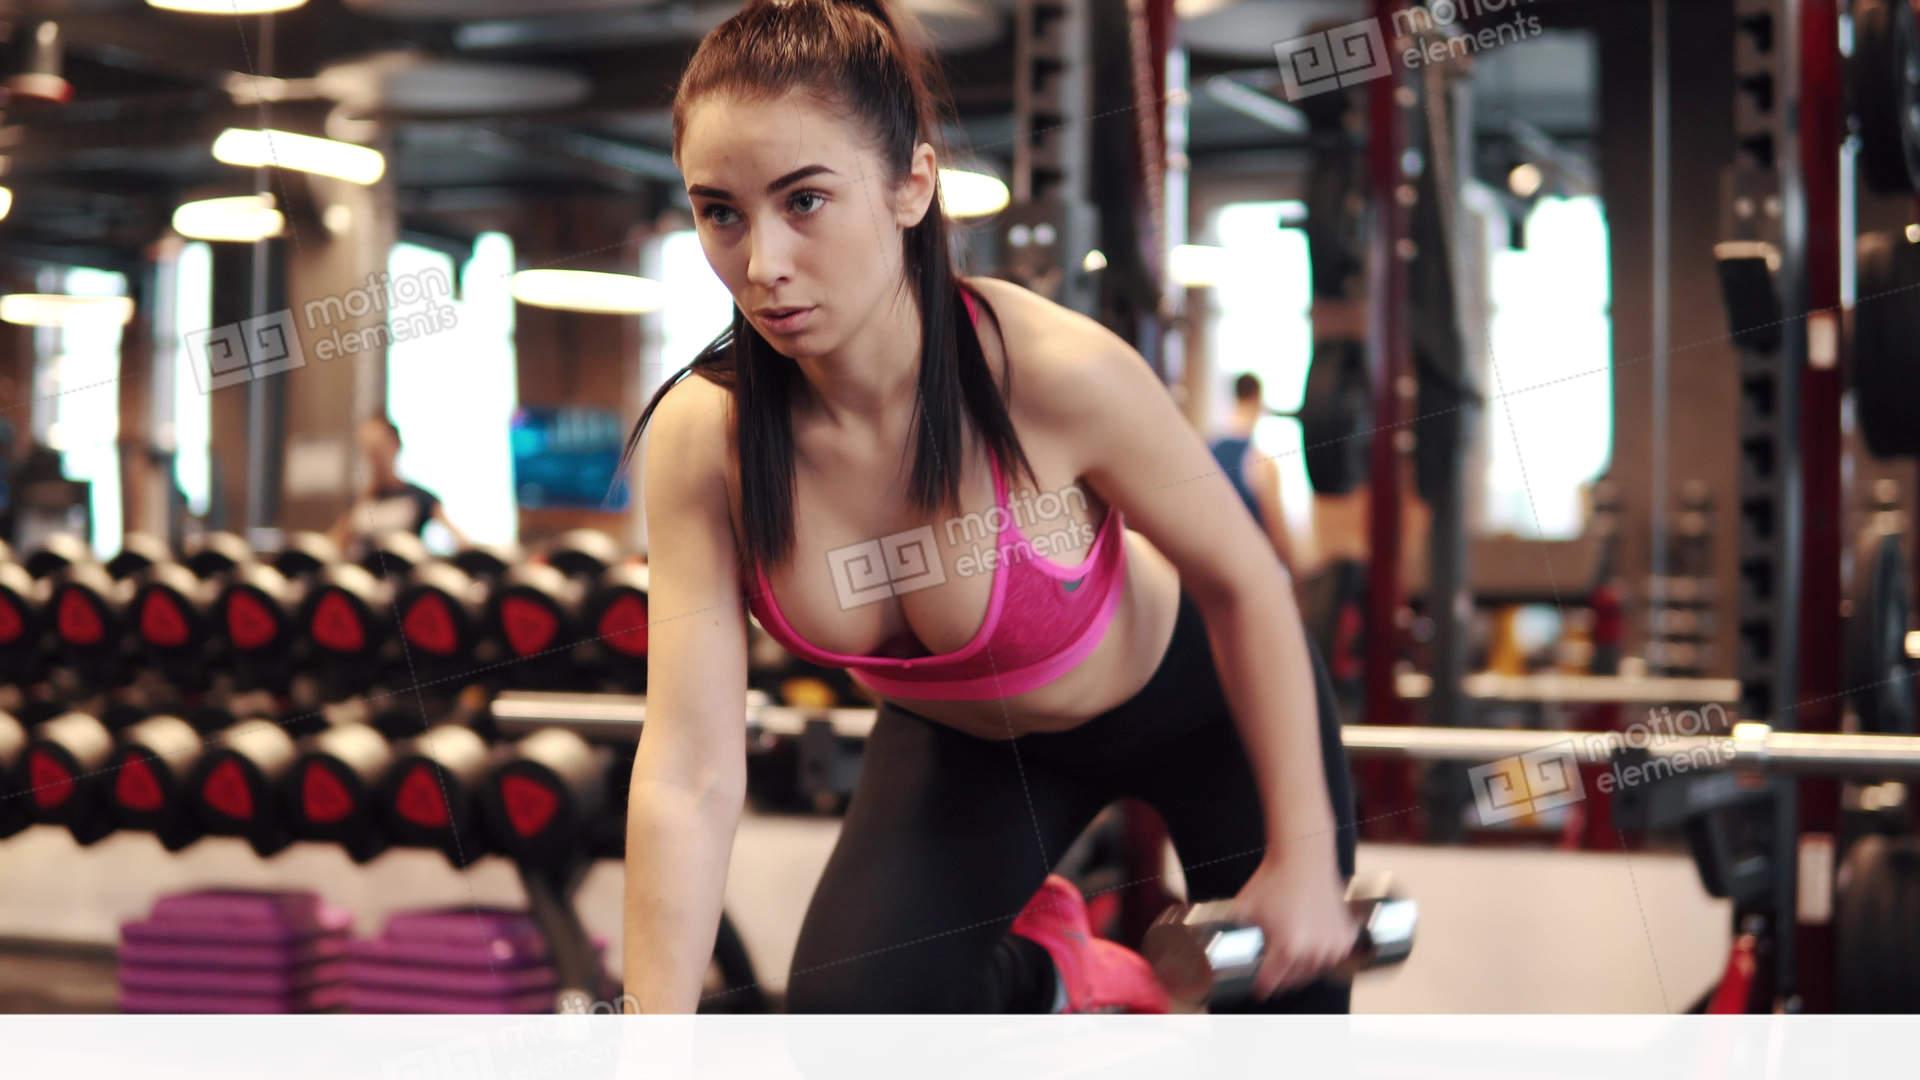 Gym 3d Wallpaper Fitness Motivation Women Bodybuilding Motivation Sexy